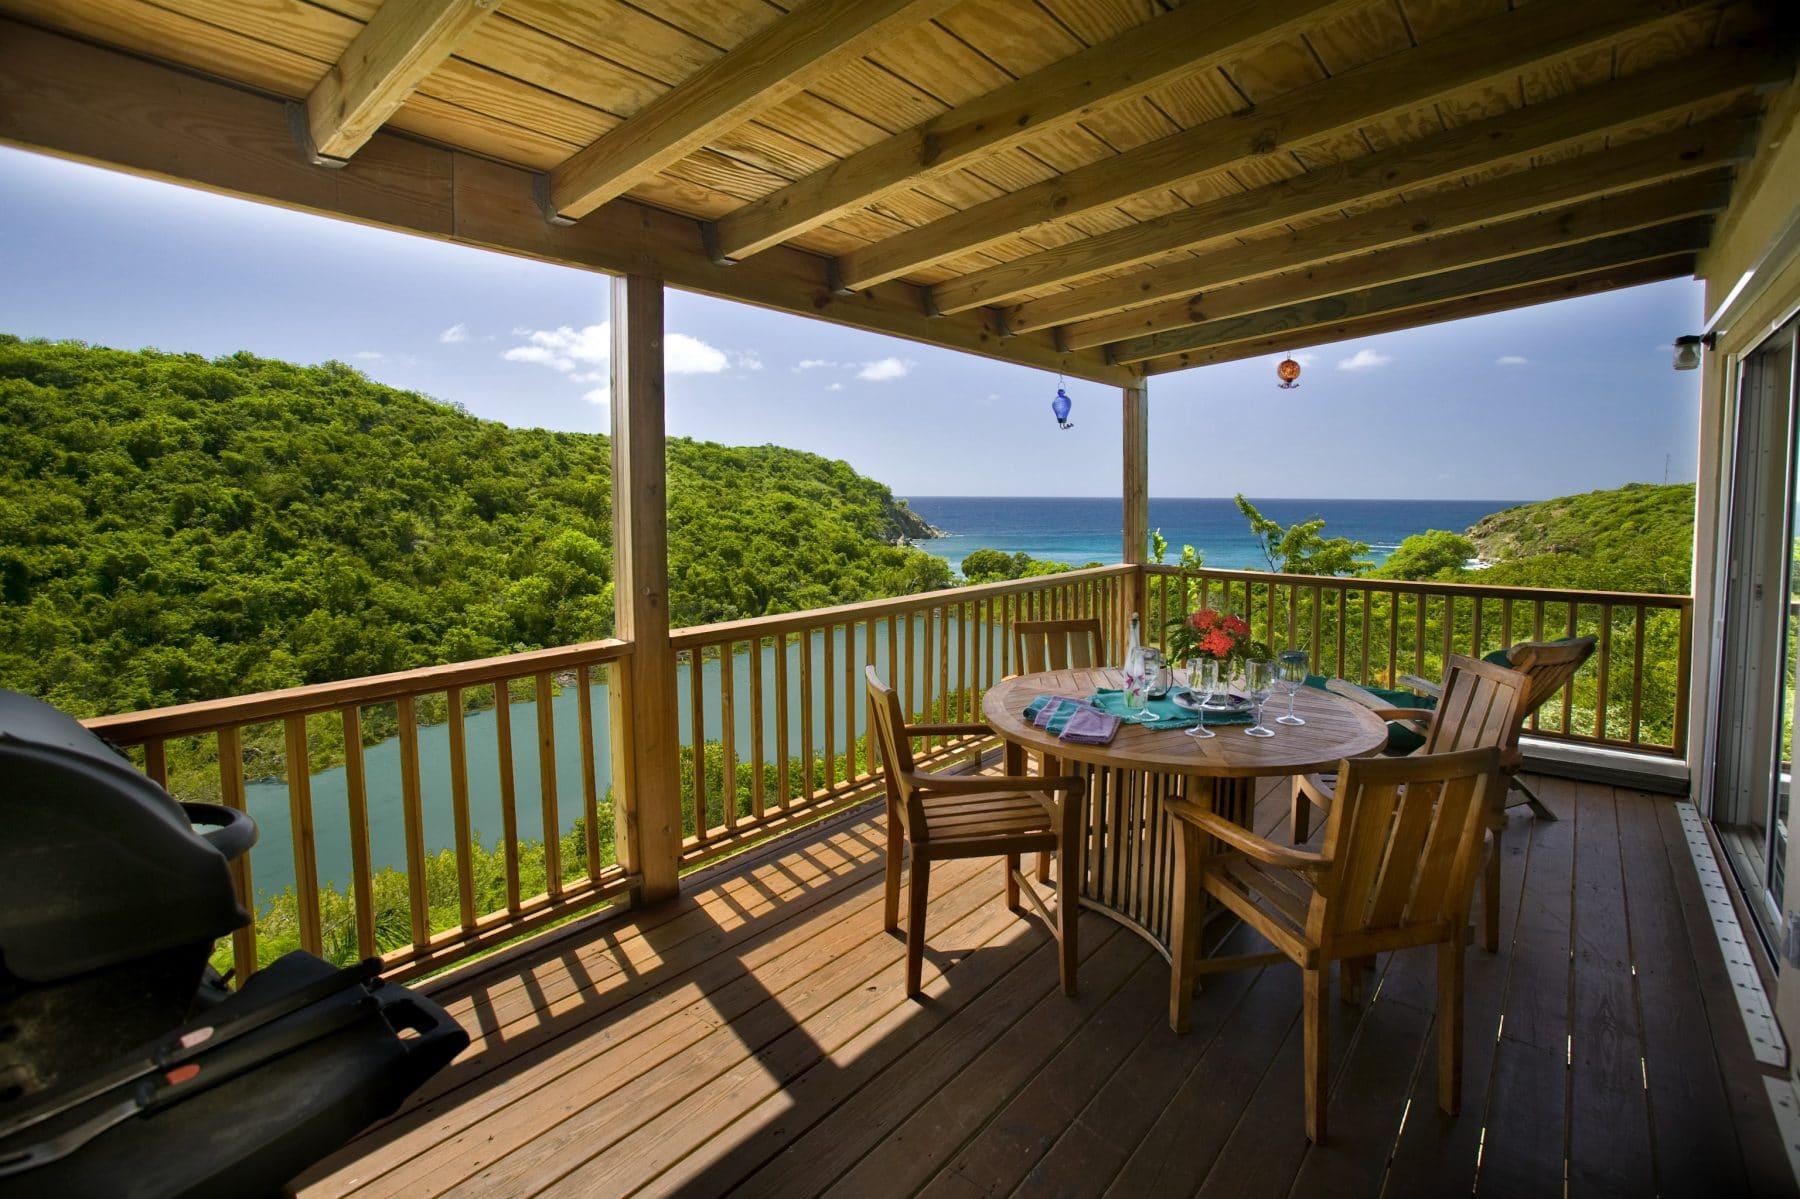 Lille Paradis Deck virgin islands vacation